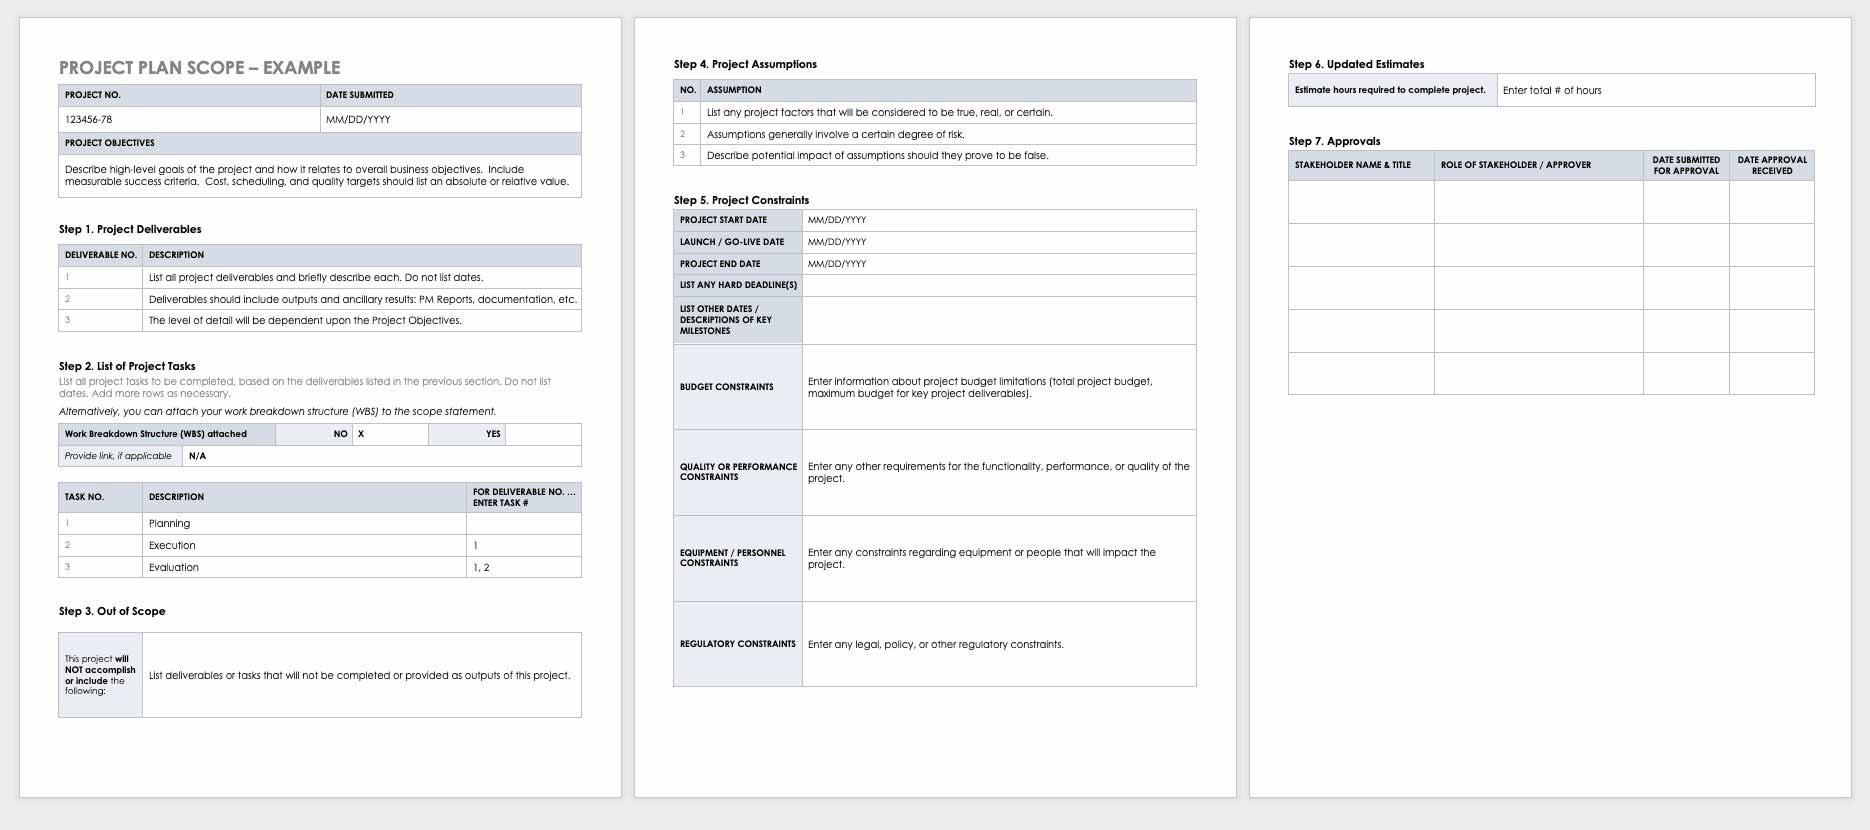 Project-Plan-Scope-Template